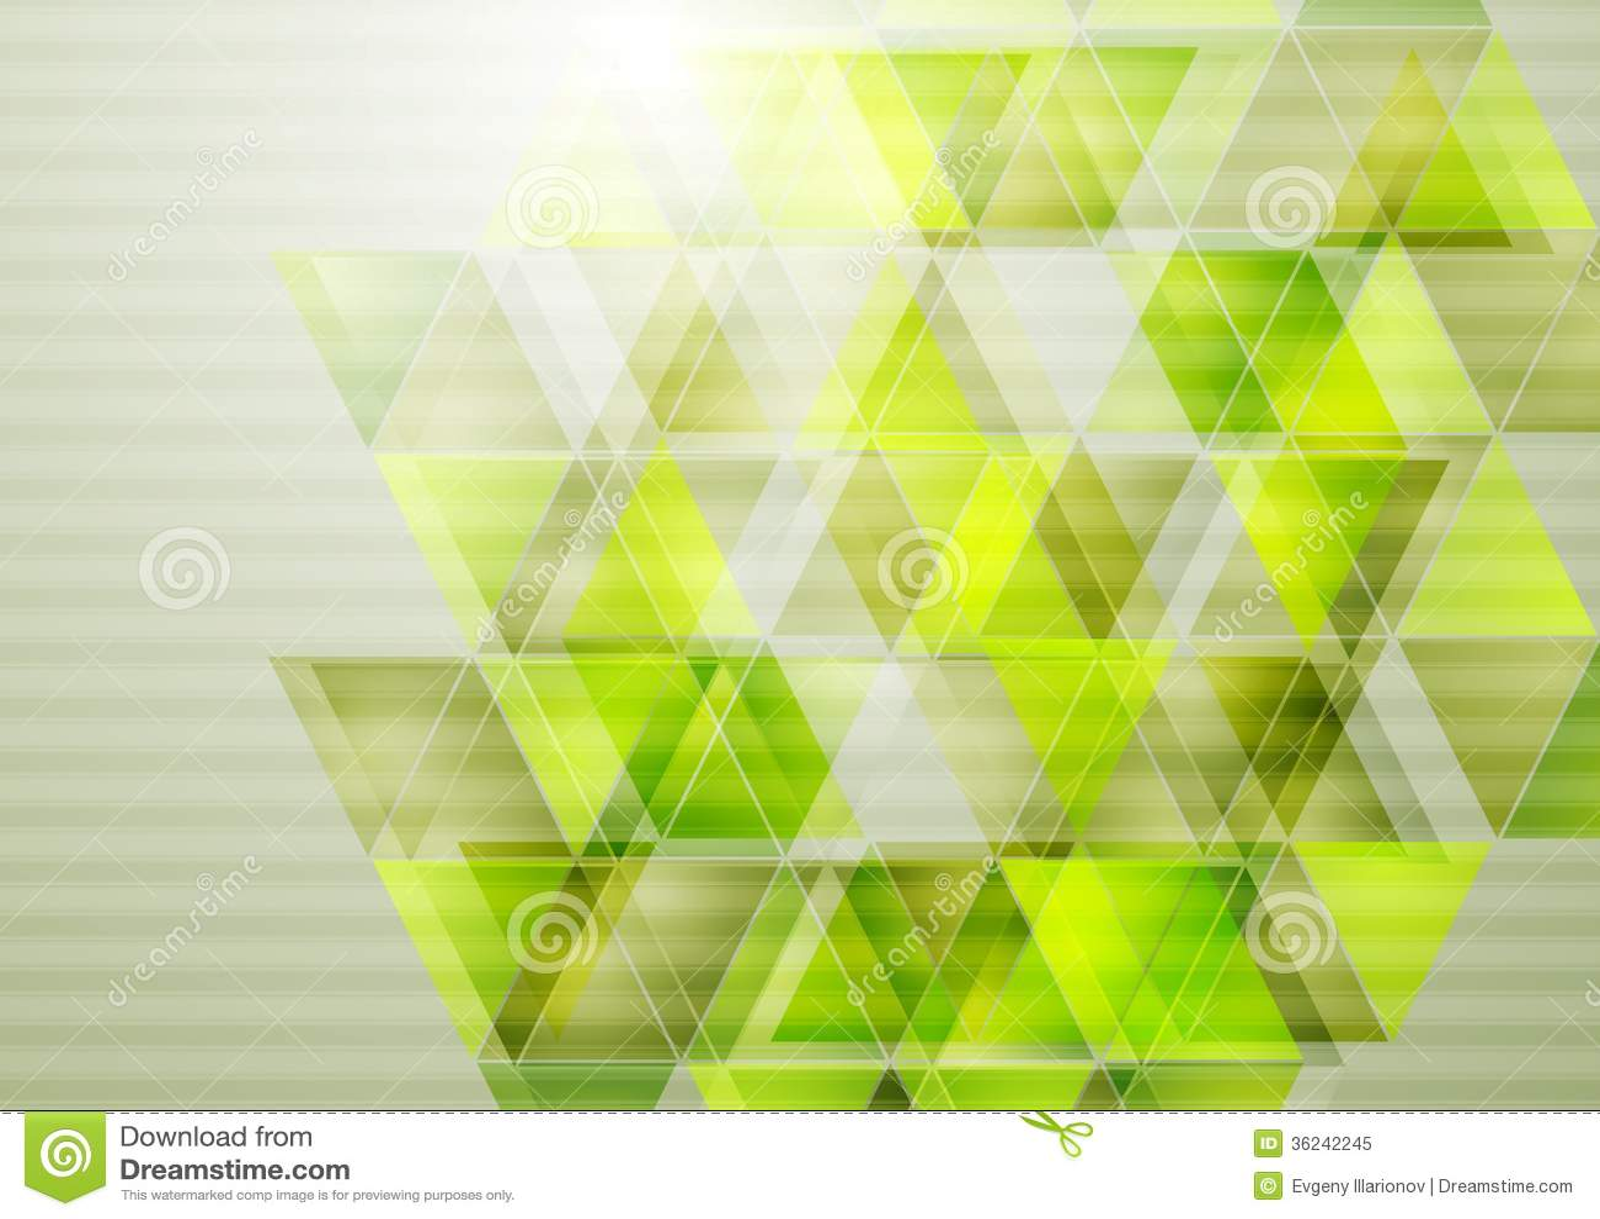 Free Vectors Vector Technology Background: Green Technology Vector Design Stock Vector